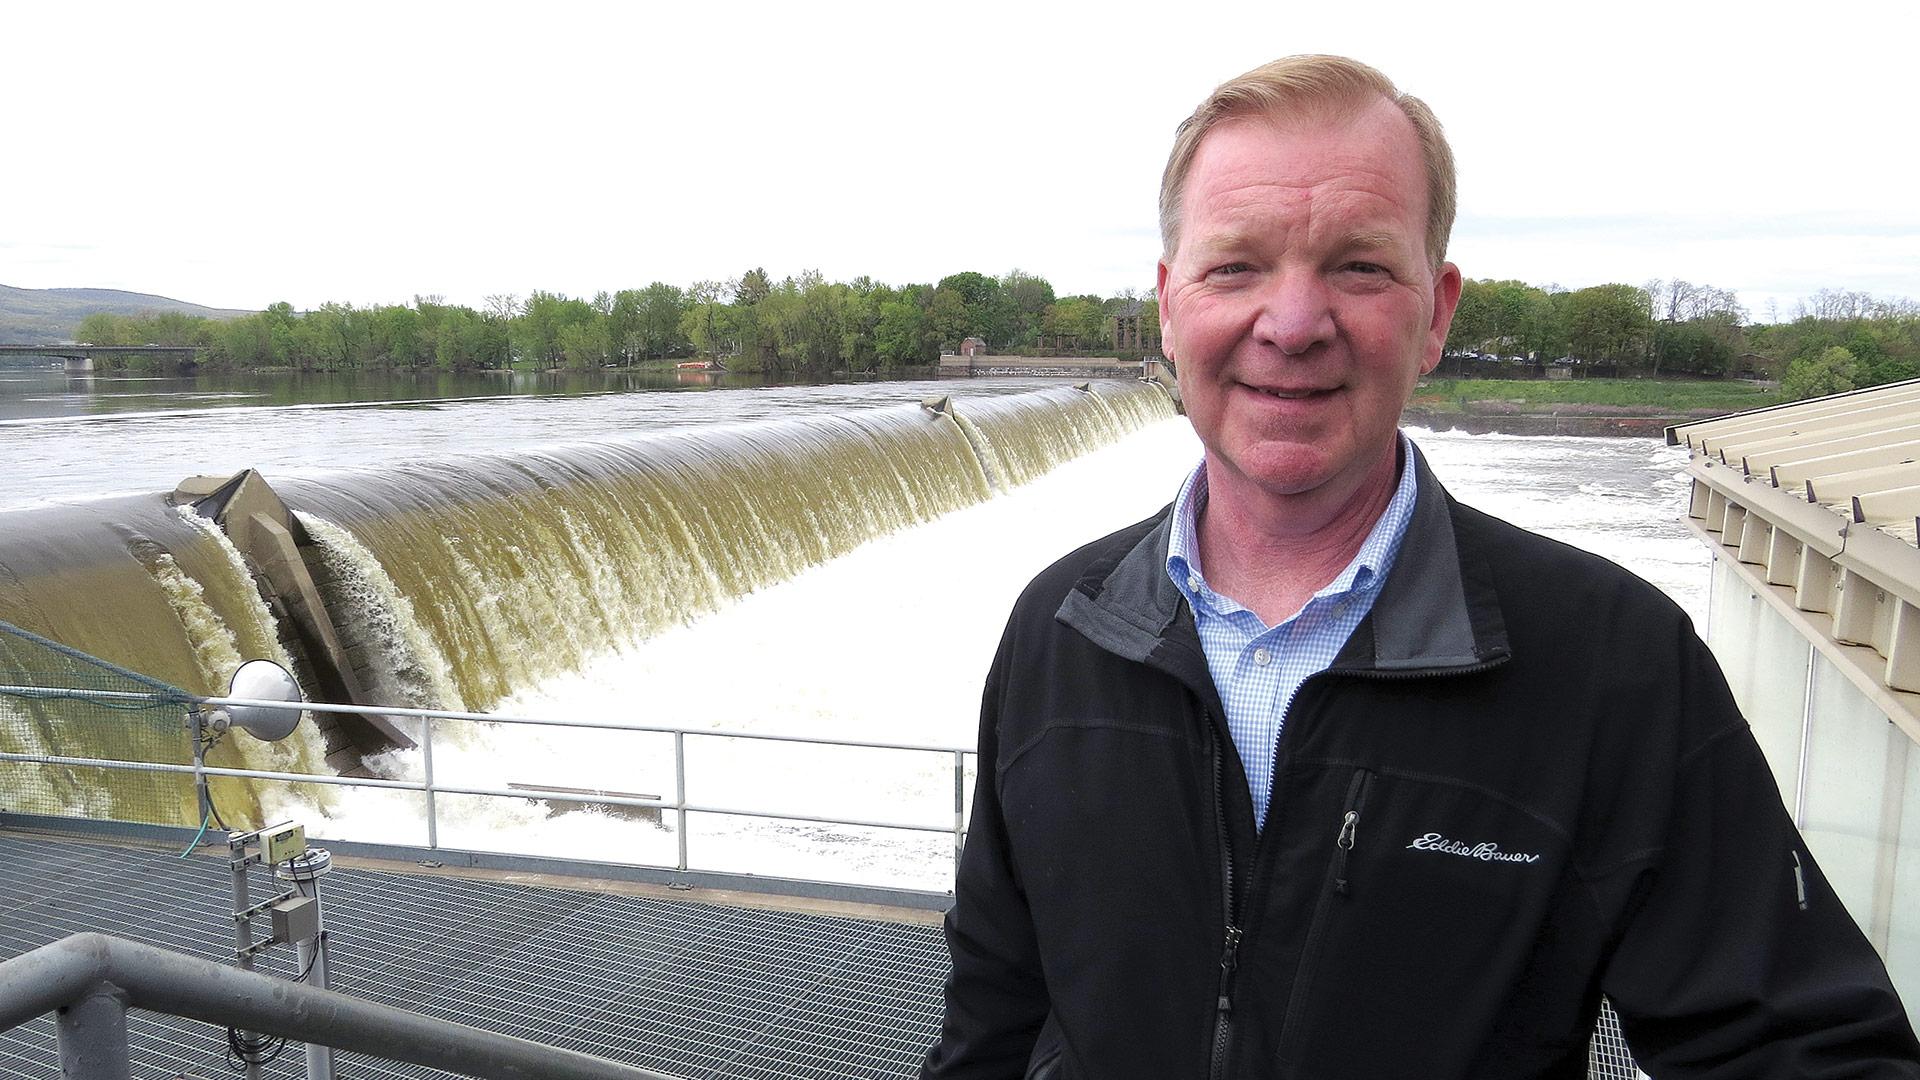 Holyoke G&E Manager Jim Lavelle